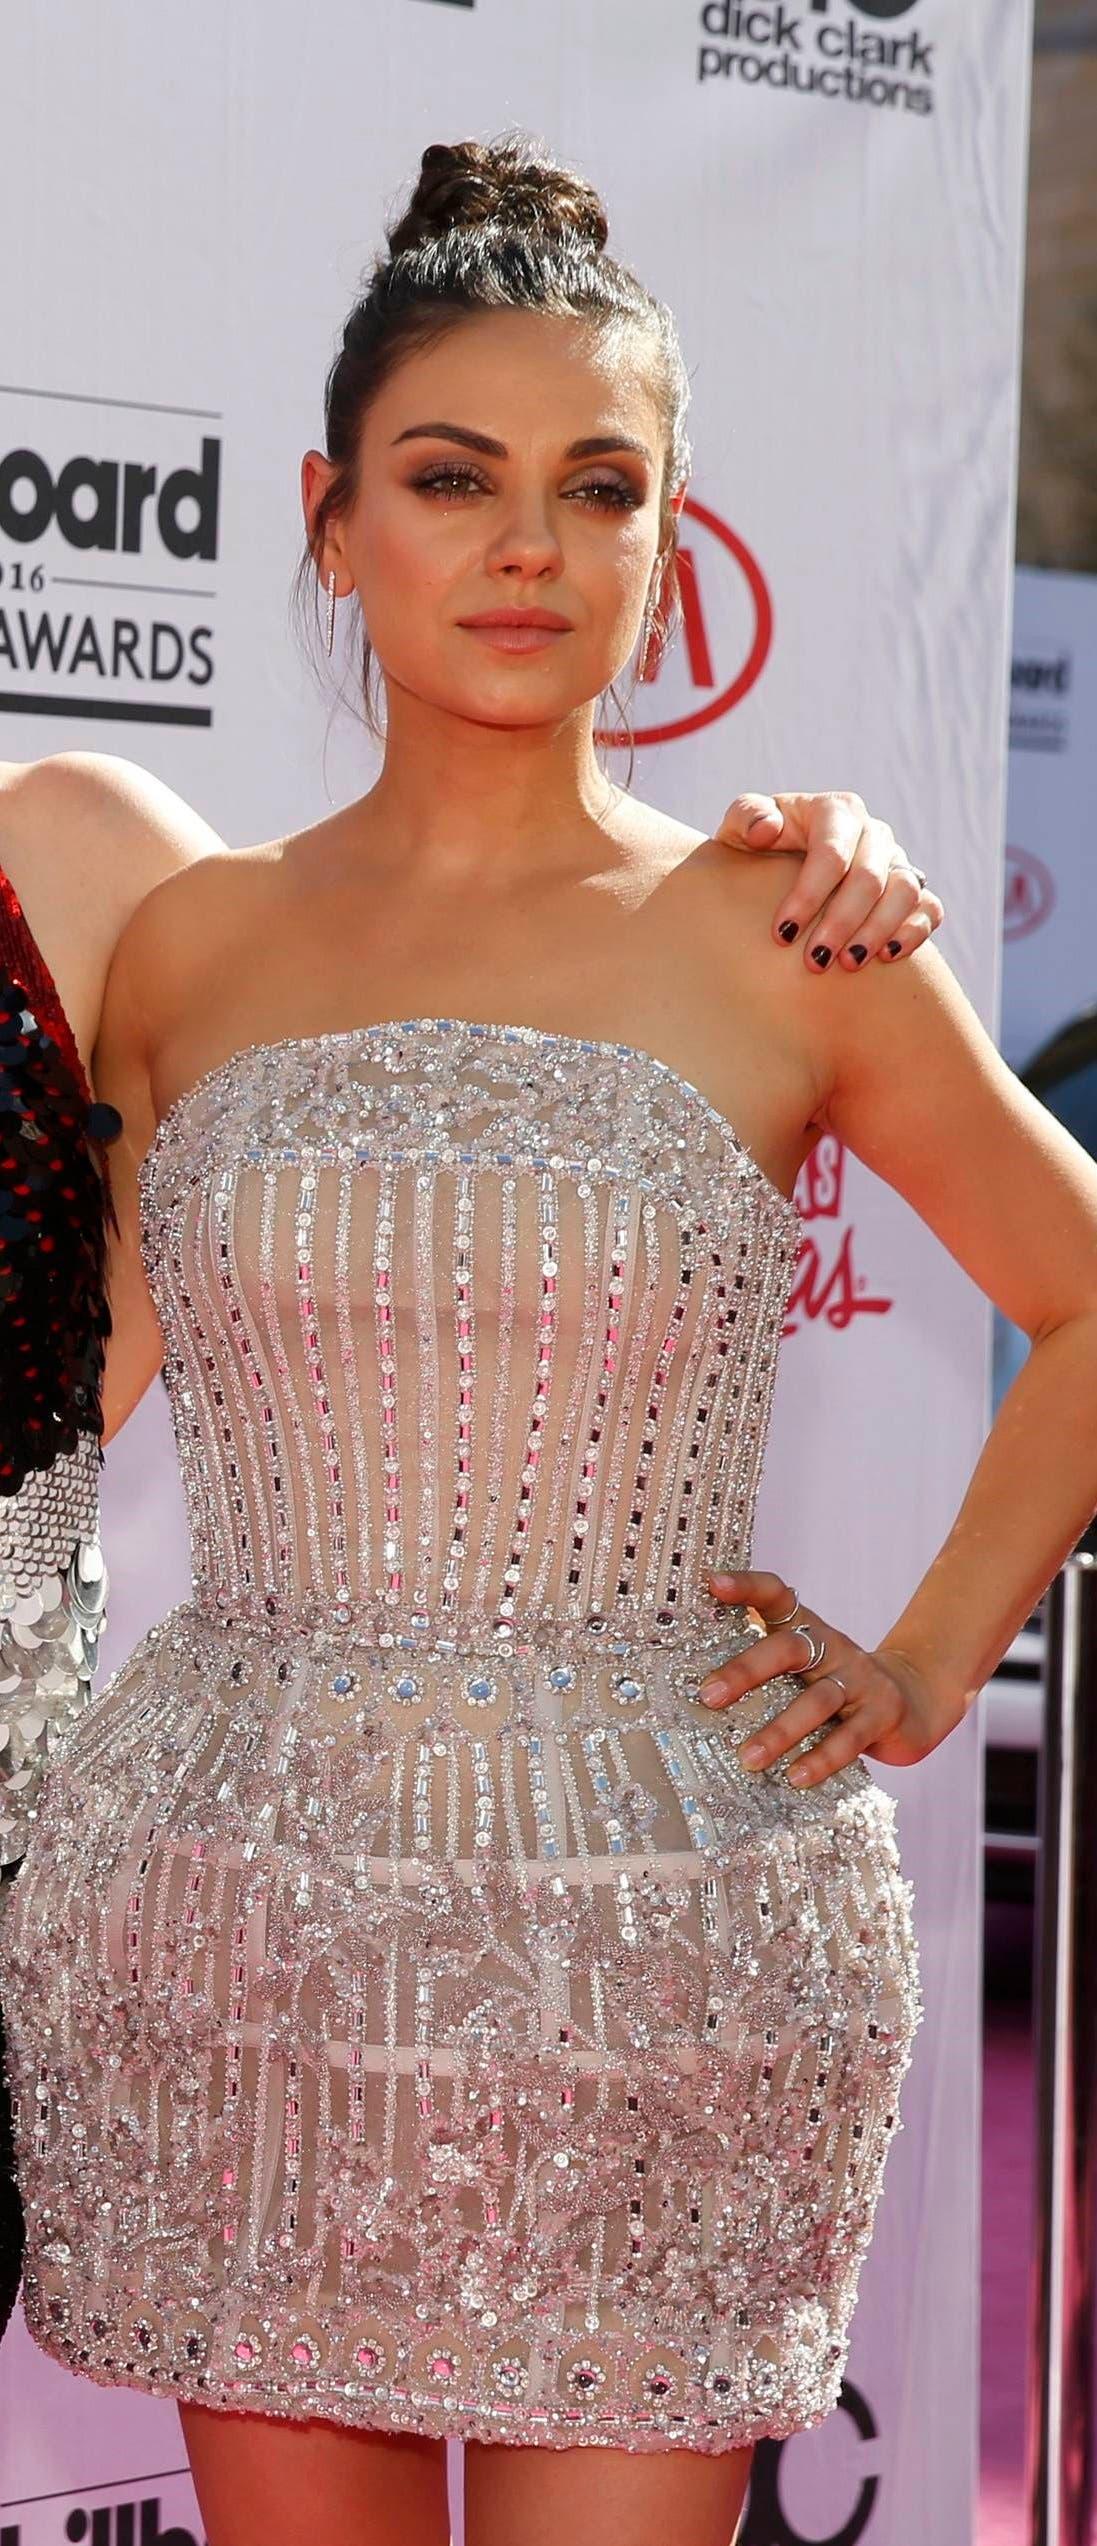 Mila Kunis arrives at the 2016 Billboard Awards in Las Vegas, Nevada, US, May 22, 2016. (Reuters)